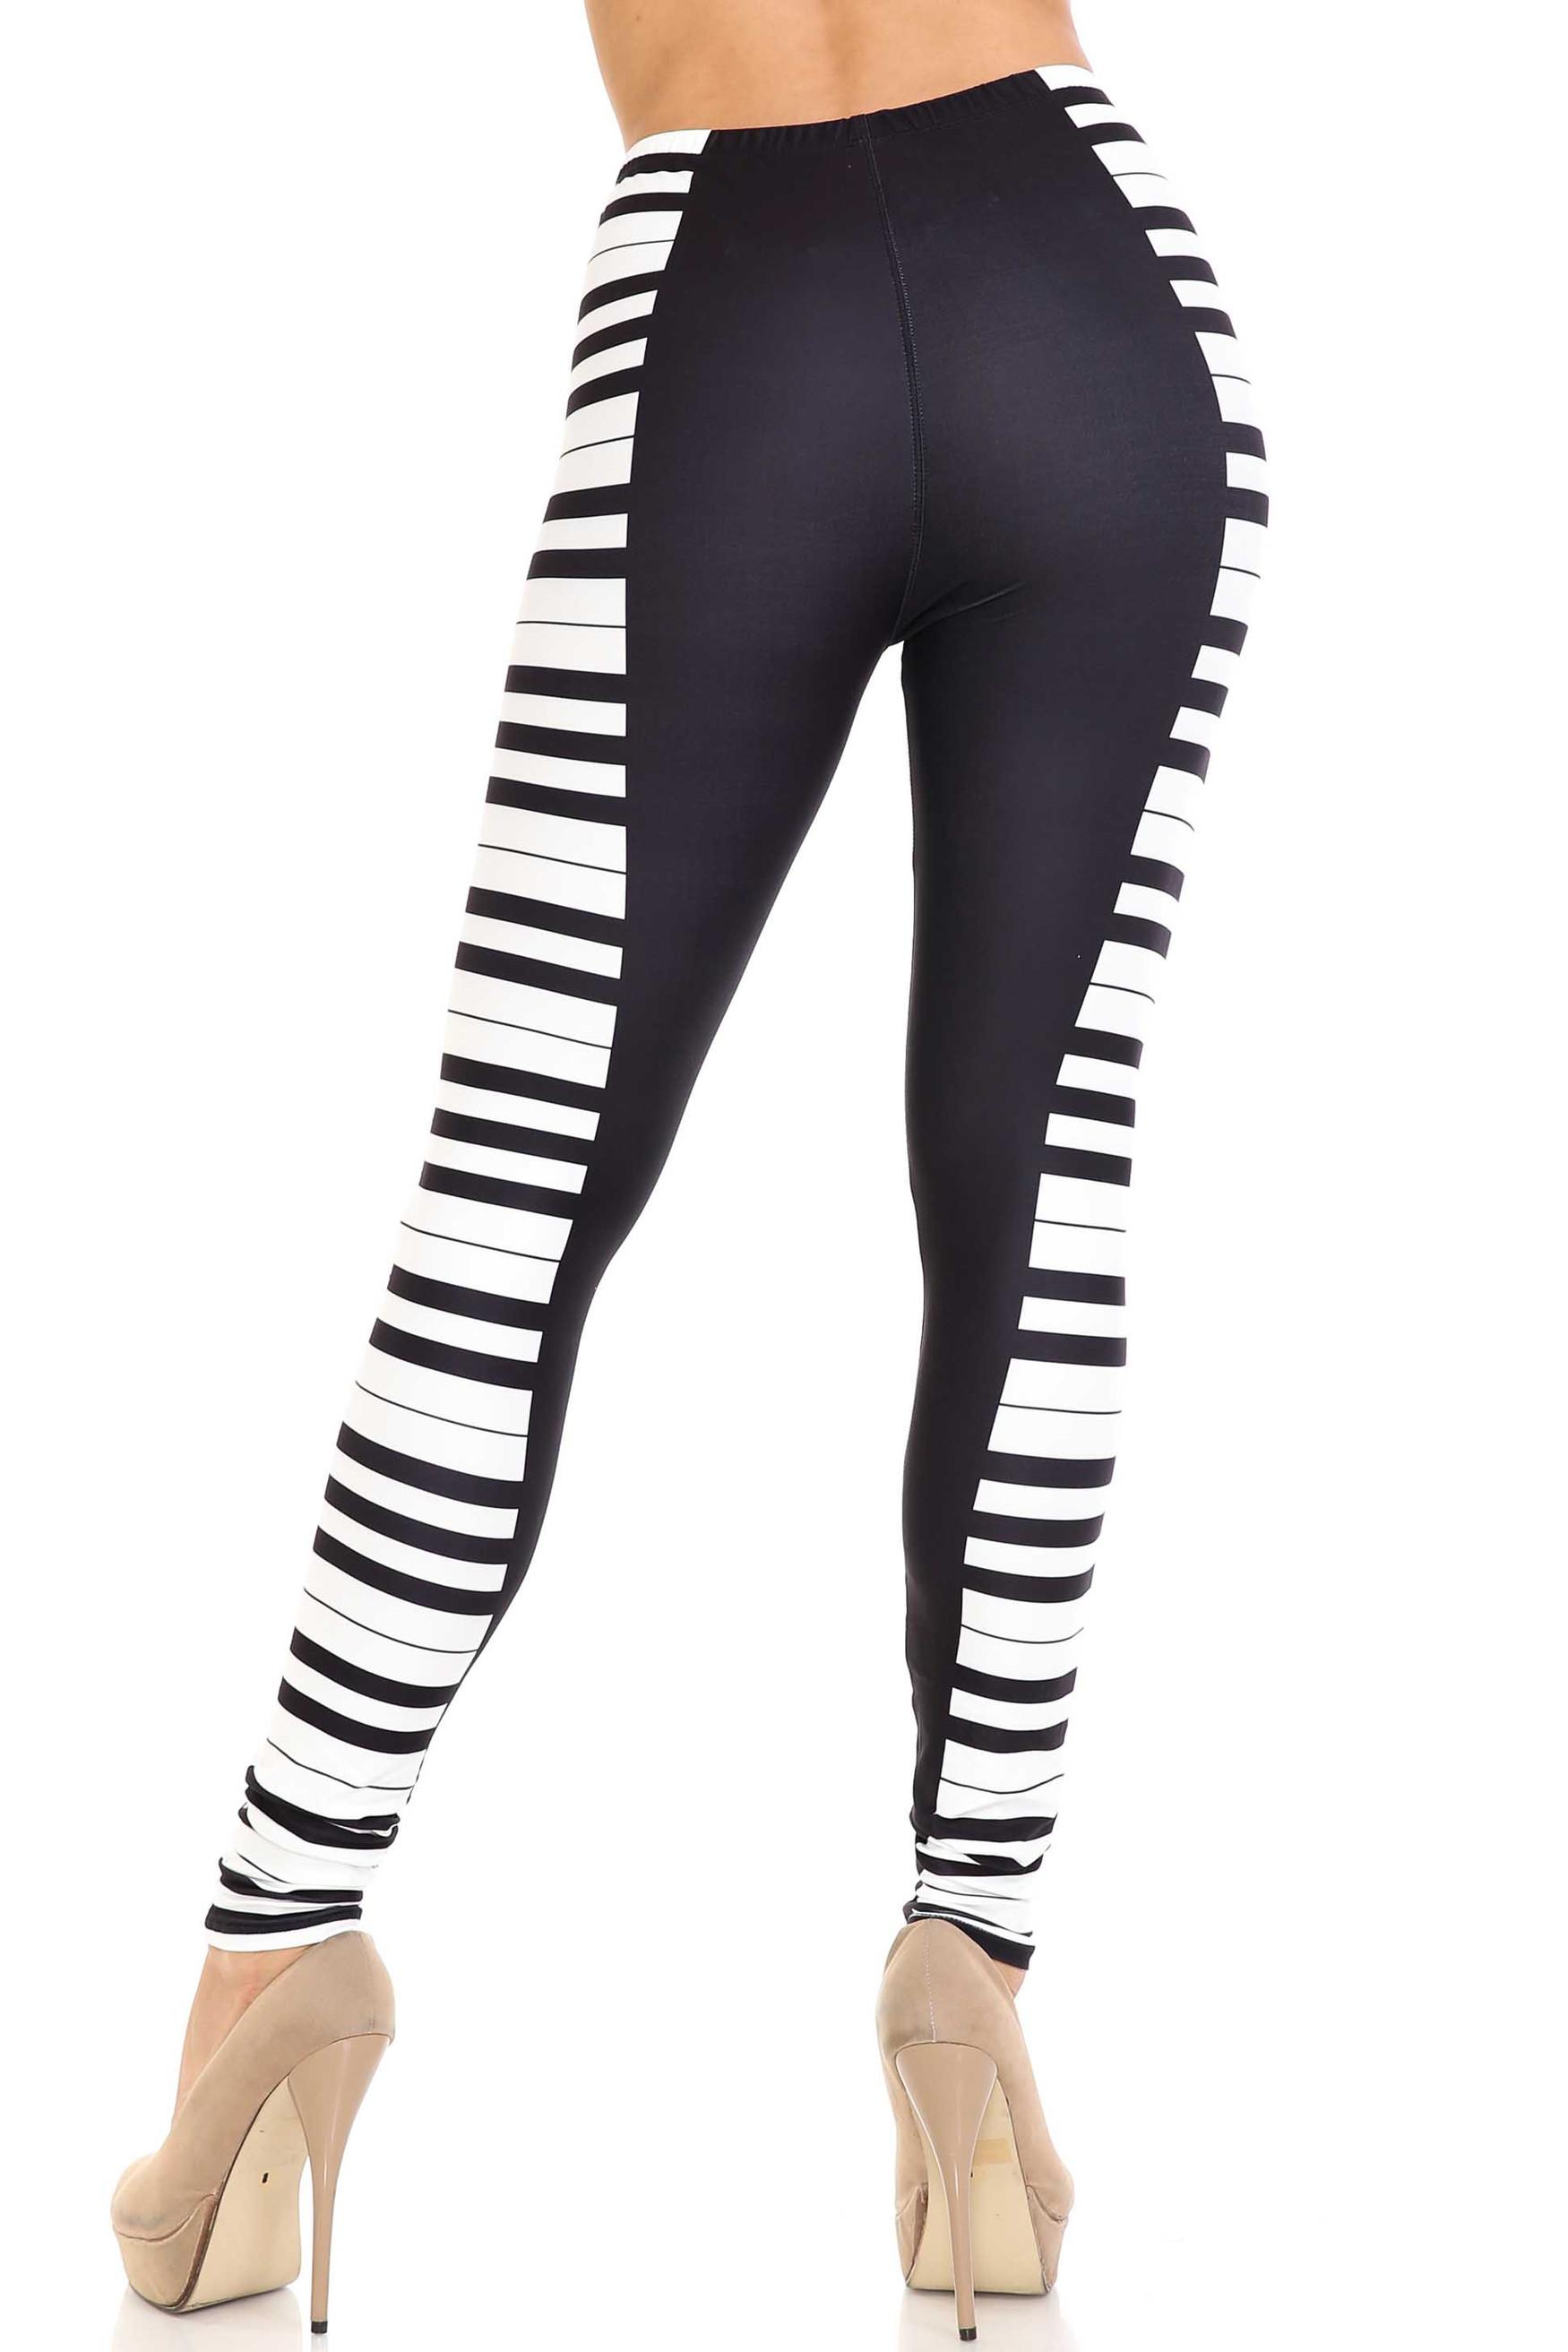 Creamy Soft Keys of the Piano Plus Size Leggings - USA Fashion™